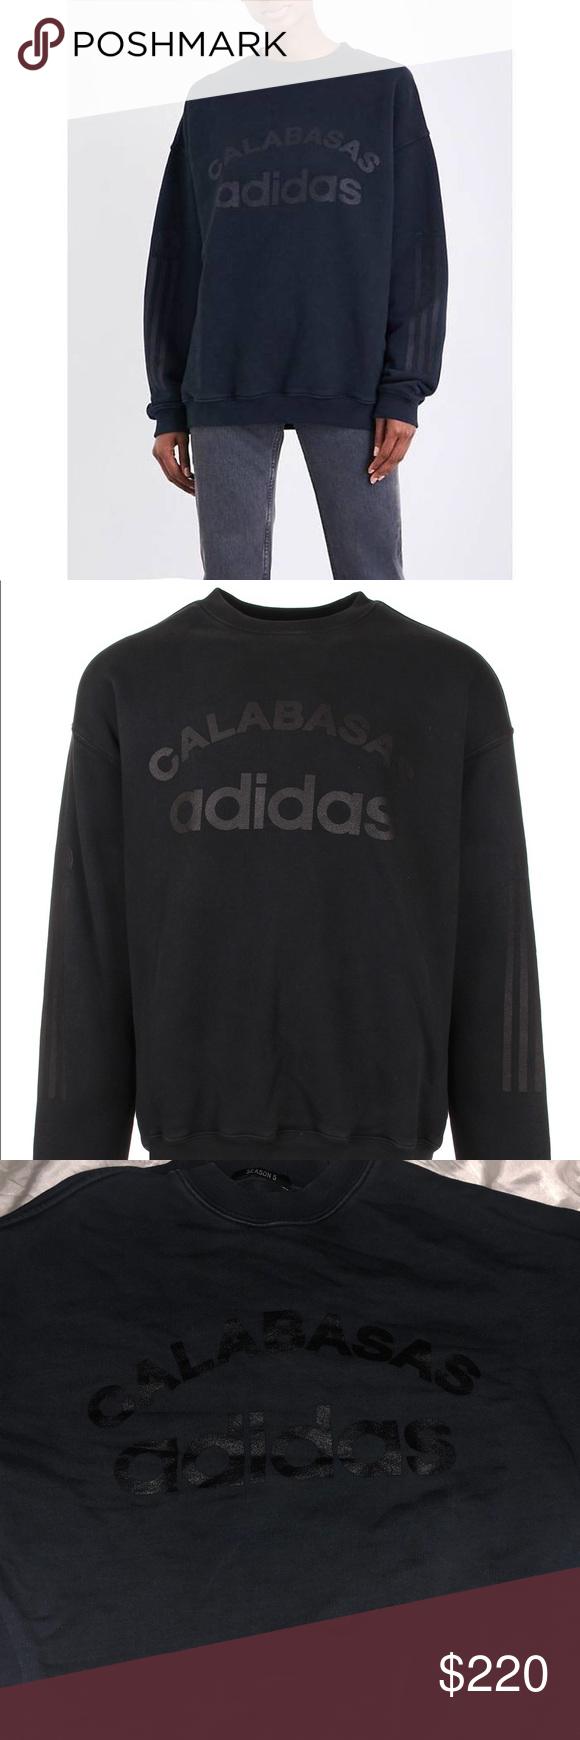 Yeezy X Adidas Season 5 Calabasas Sweatshirt From The Season 5 Collection Men S Black Yeezy For Adidas Calabasas Sweatshirt Yeezy Sweater Sweatshirts Fashion [ 1740 x 580 Pixel ]